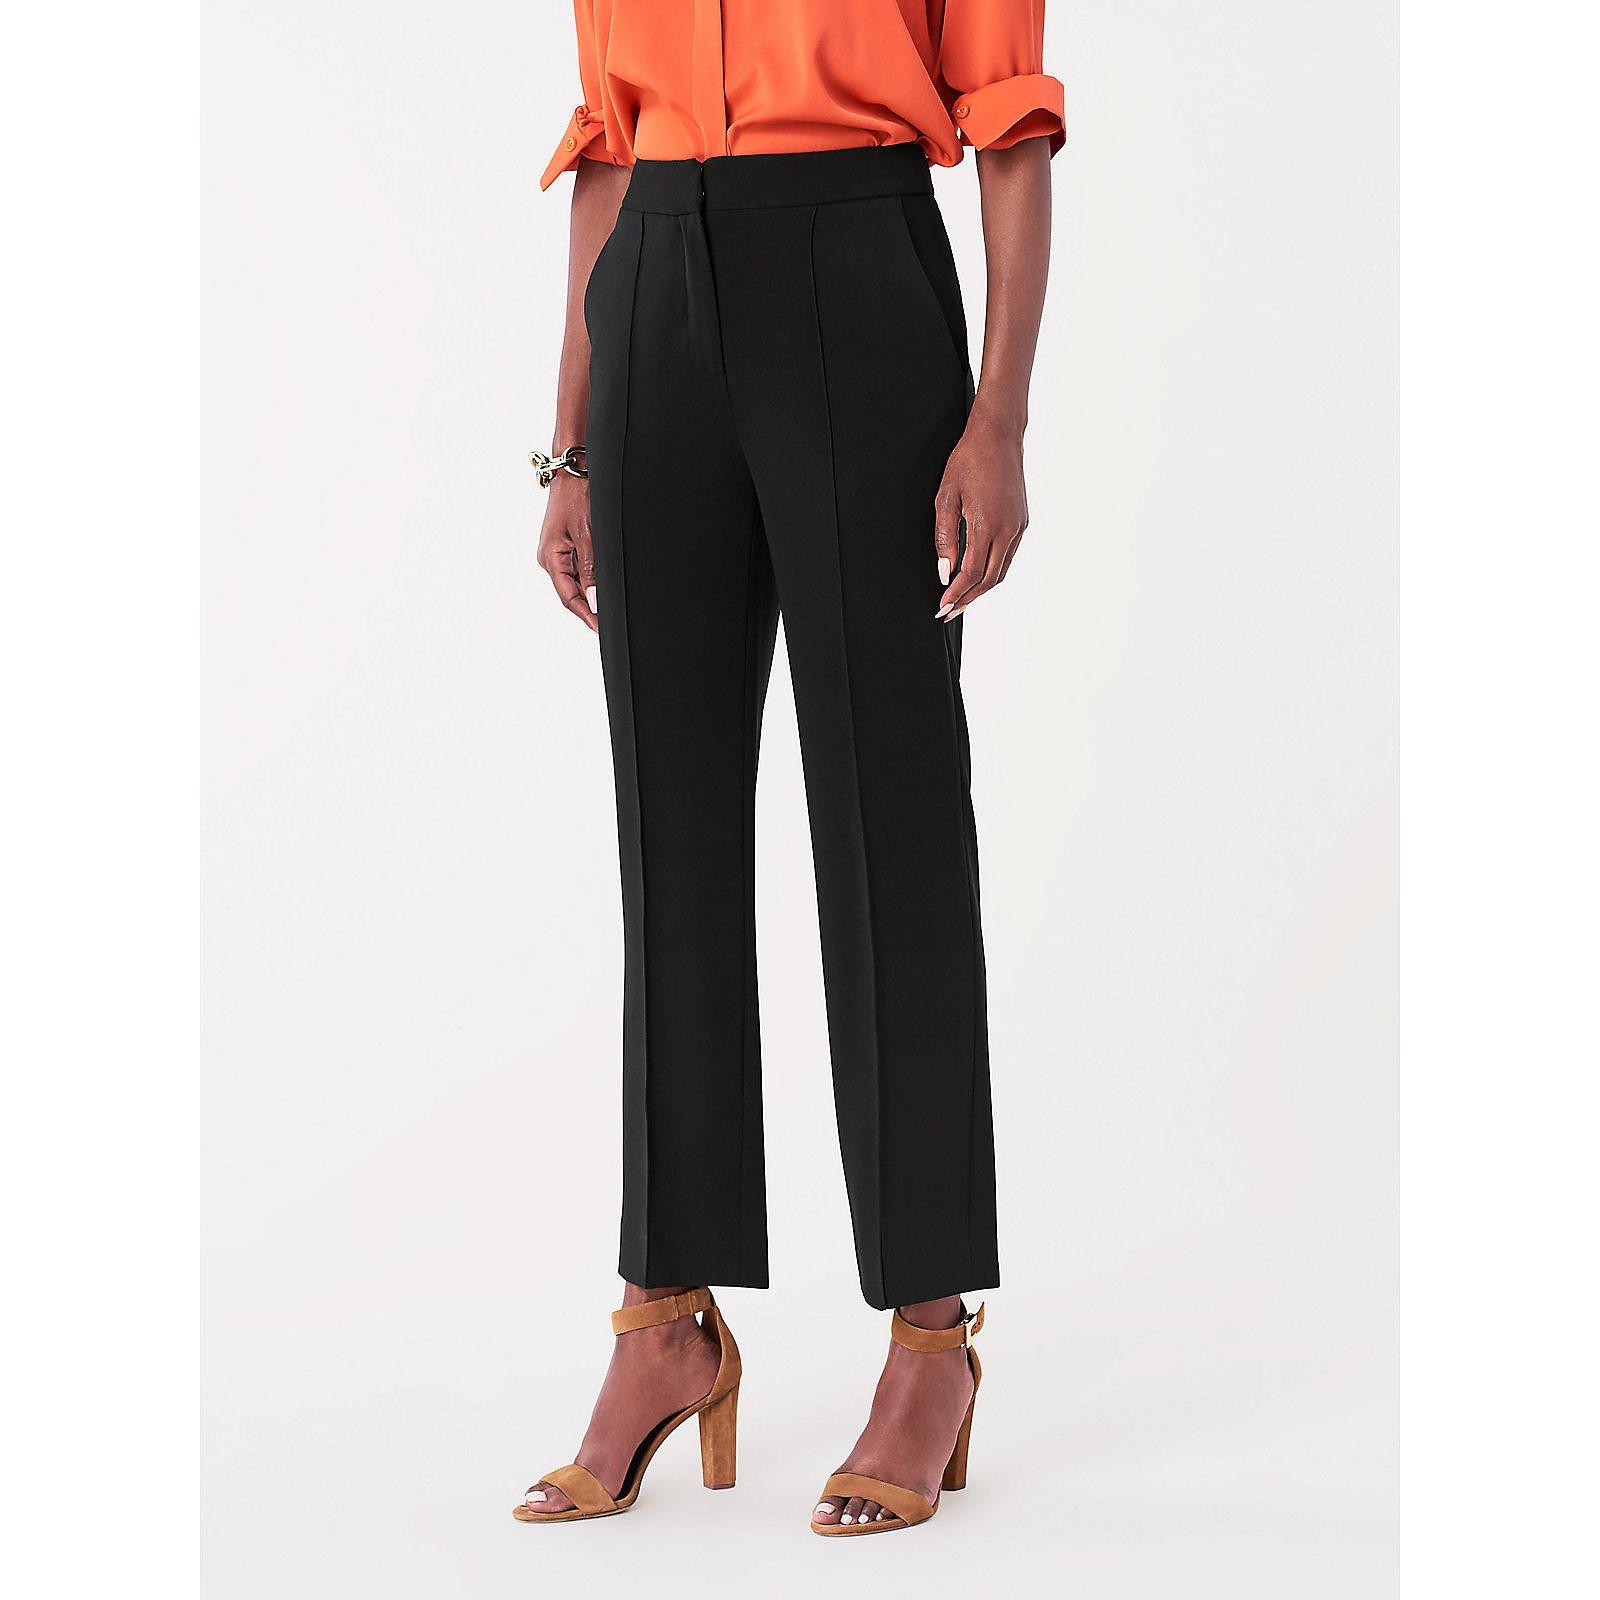 Diane von Furstenberg Jocelyn Stretch-Crepe Cropped Trousers